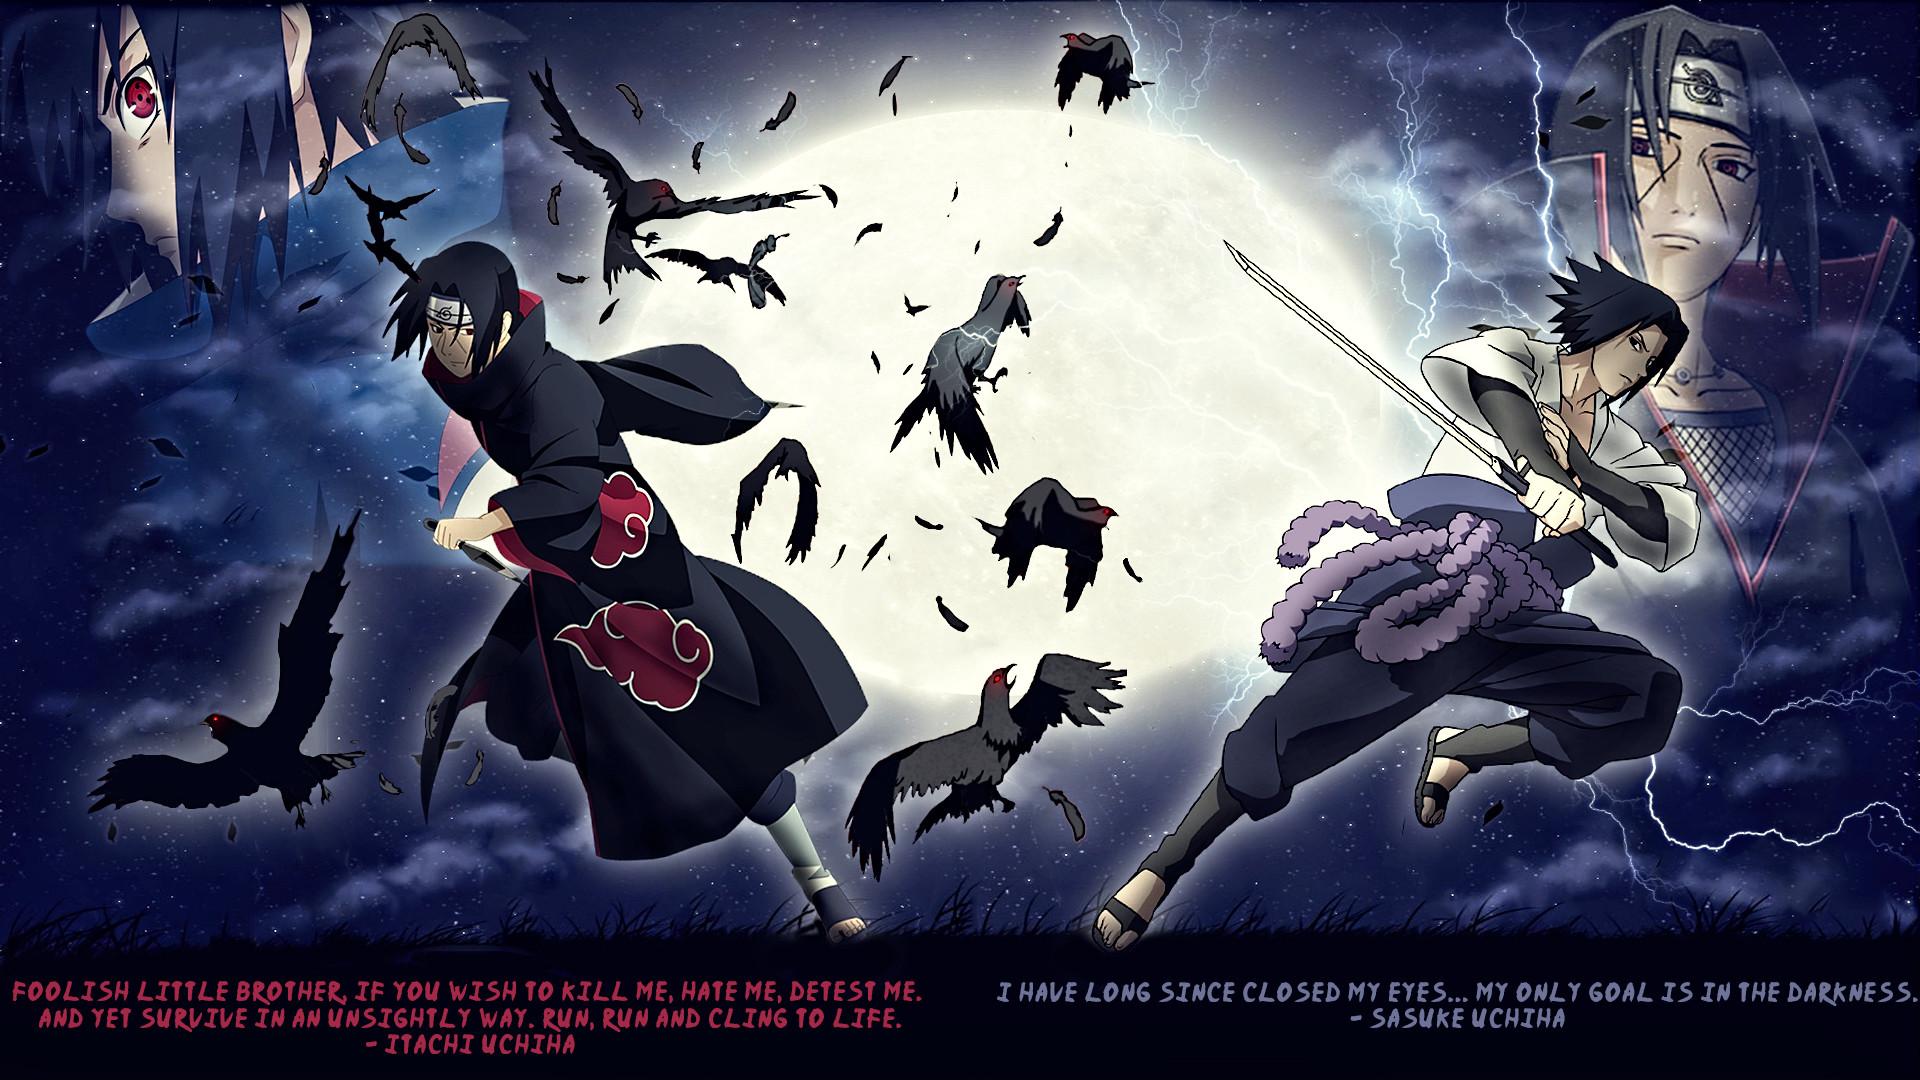 sasuke and itachi images Itachi vs Sasuke HD wallpaper and background photos